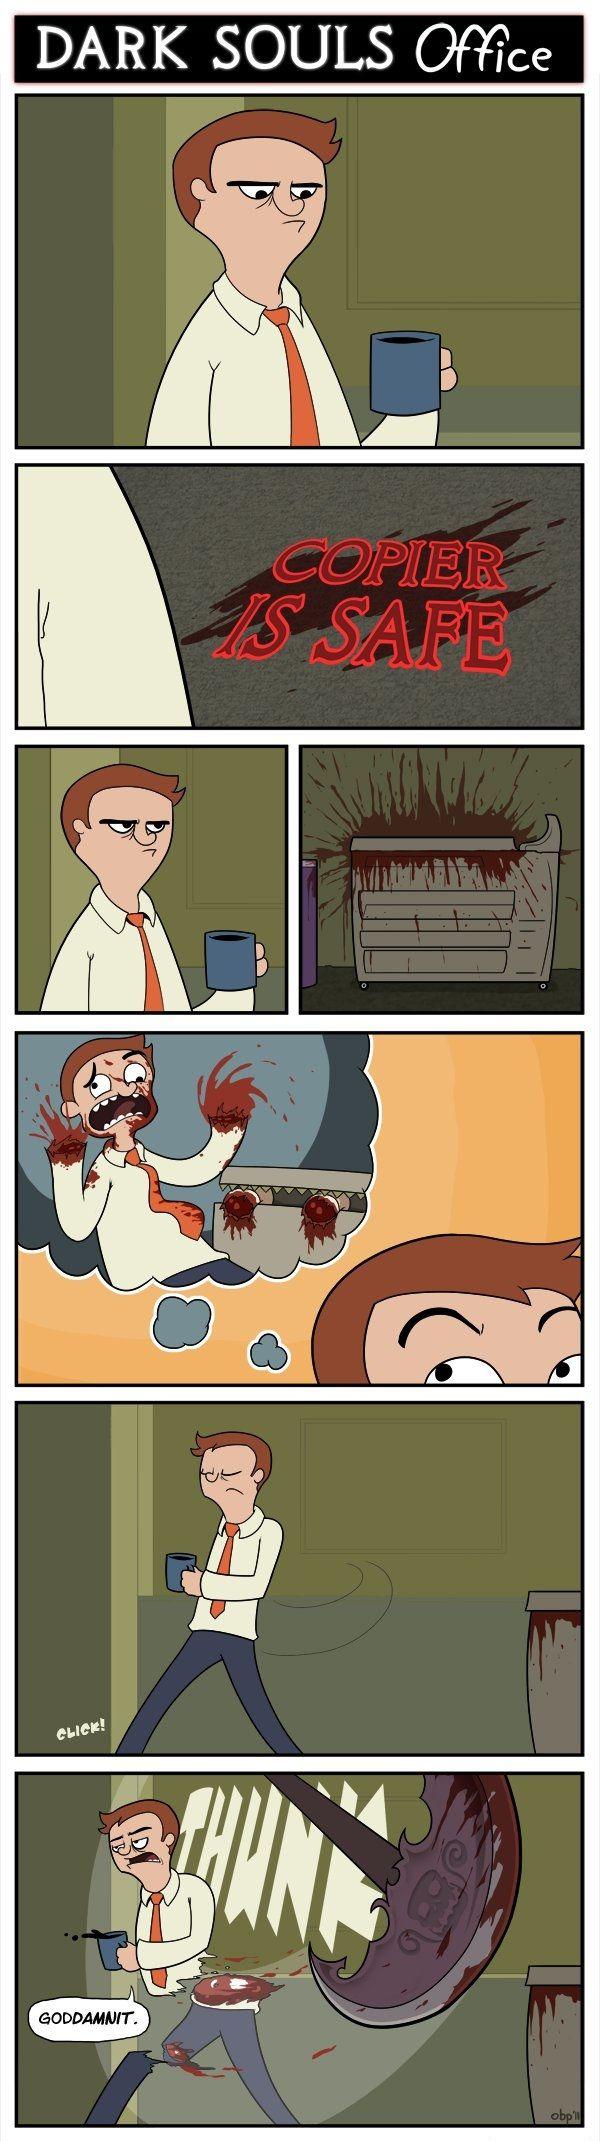 Dark Souls comic: The Office